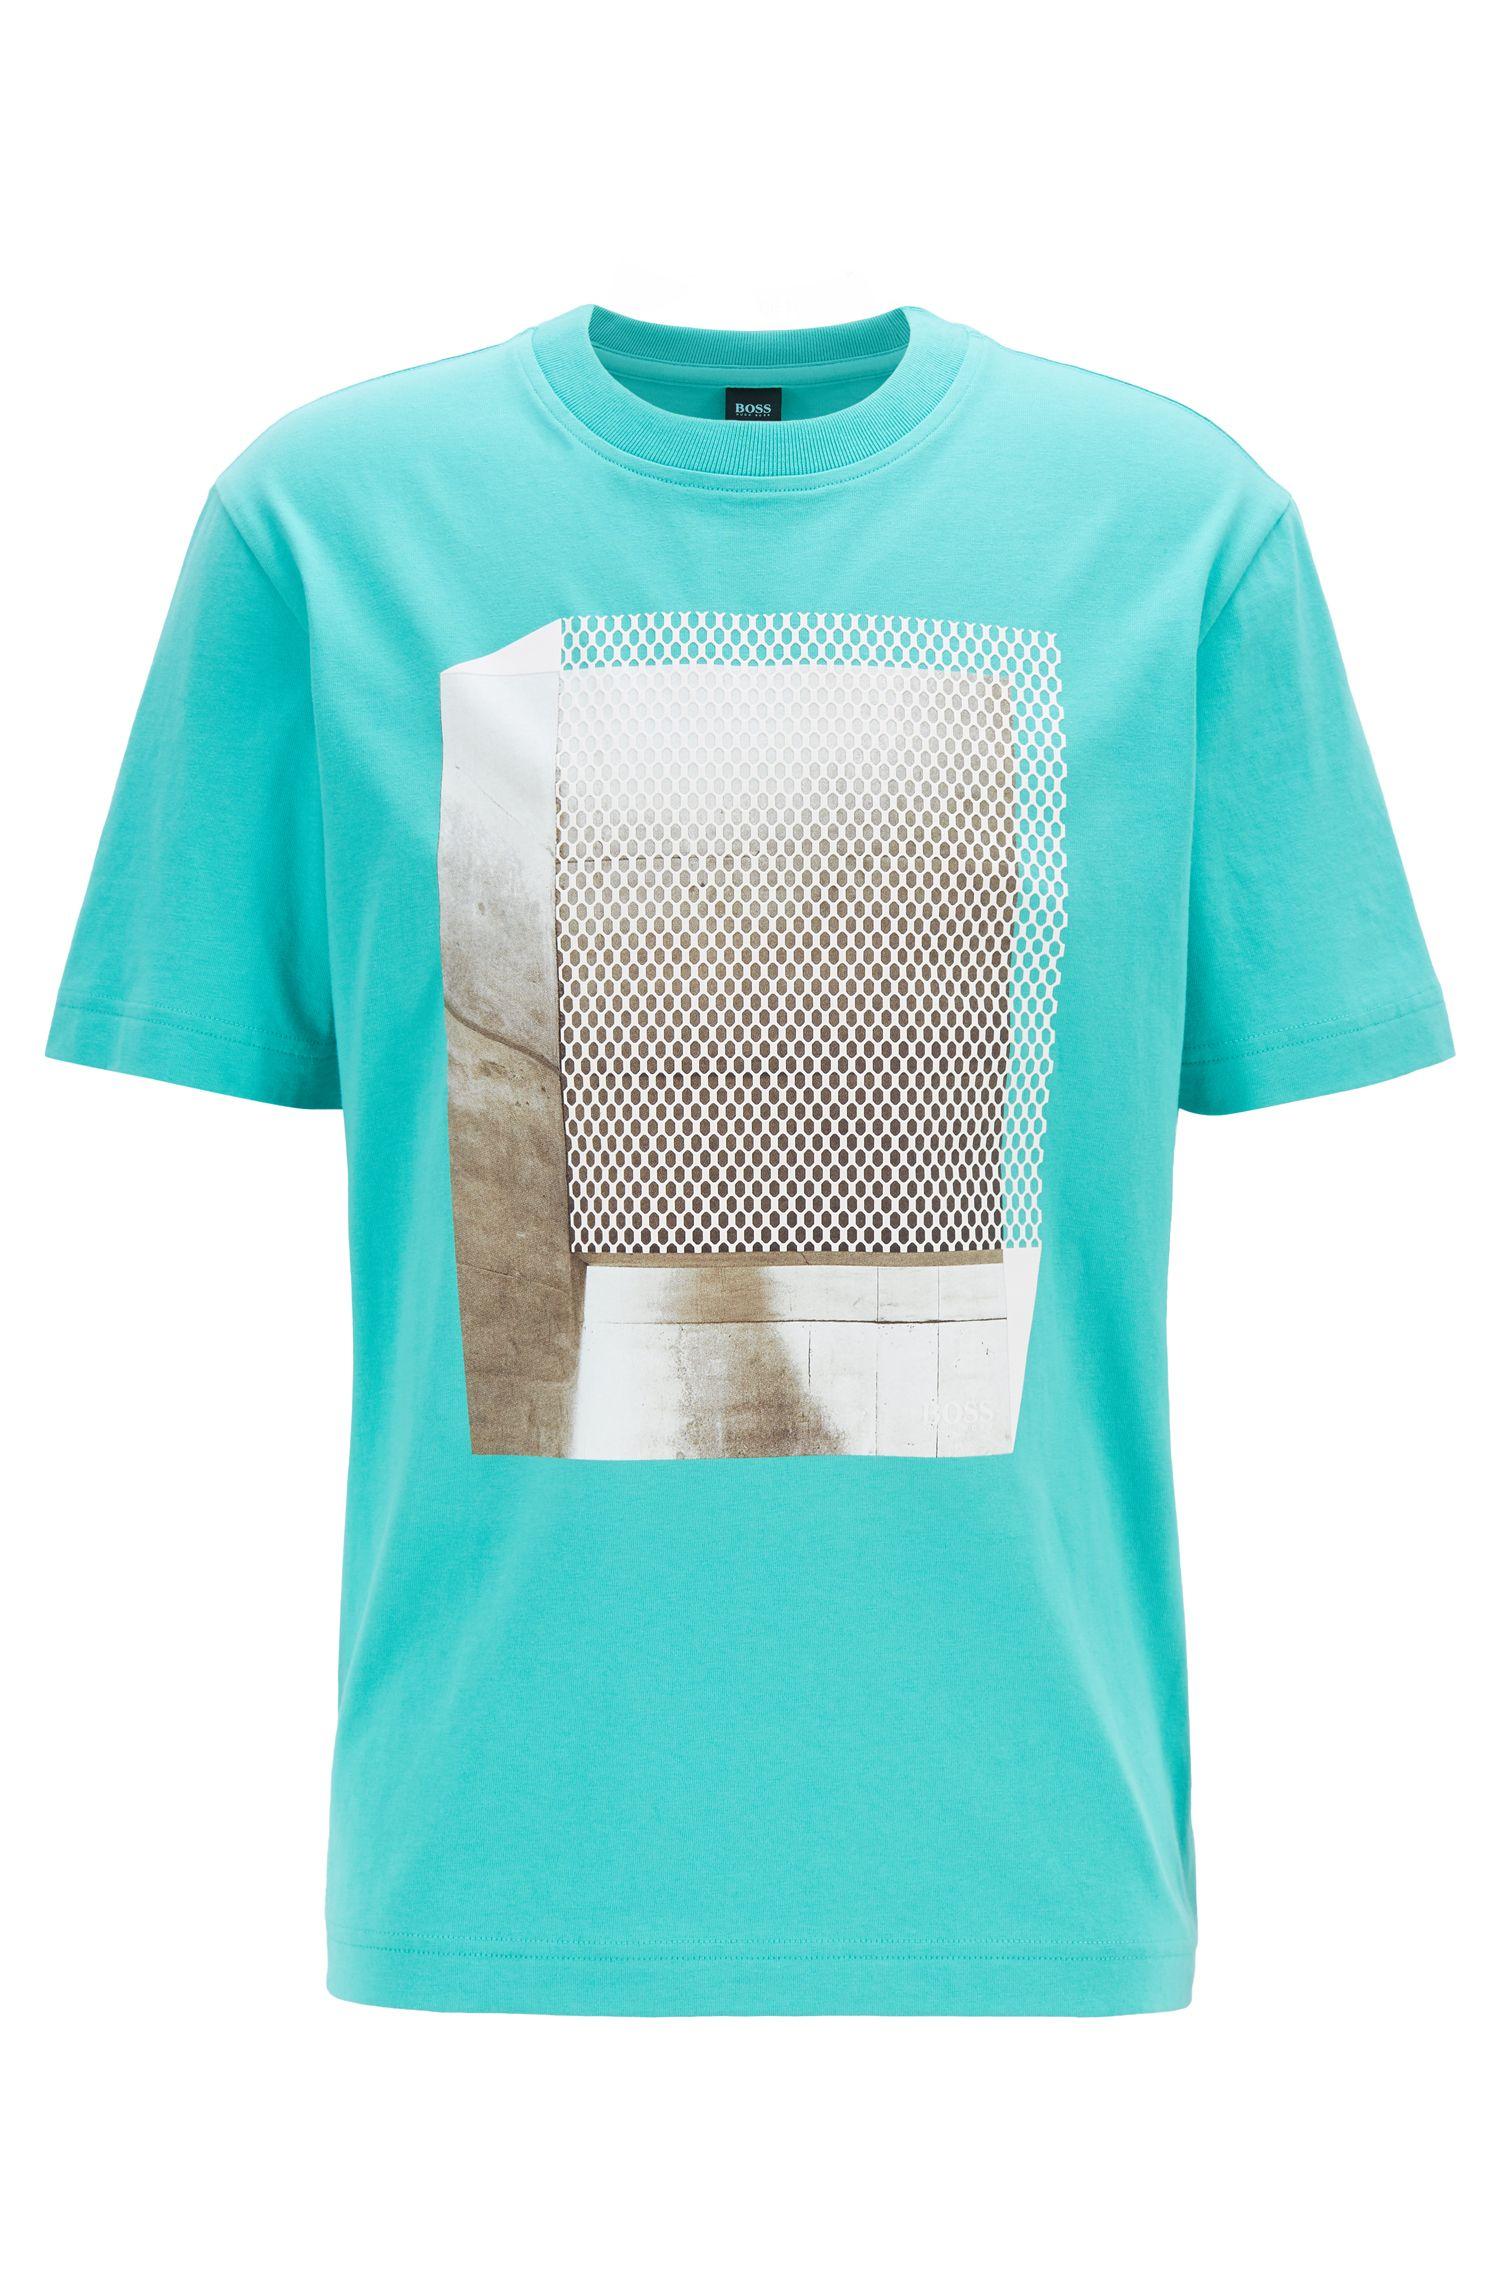 Relaxed-Fit T-Shirt aus Baumwolle mit Print in Mesh-Optik, Dunkelgrün